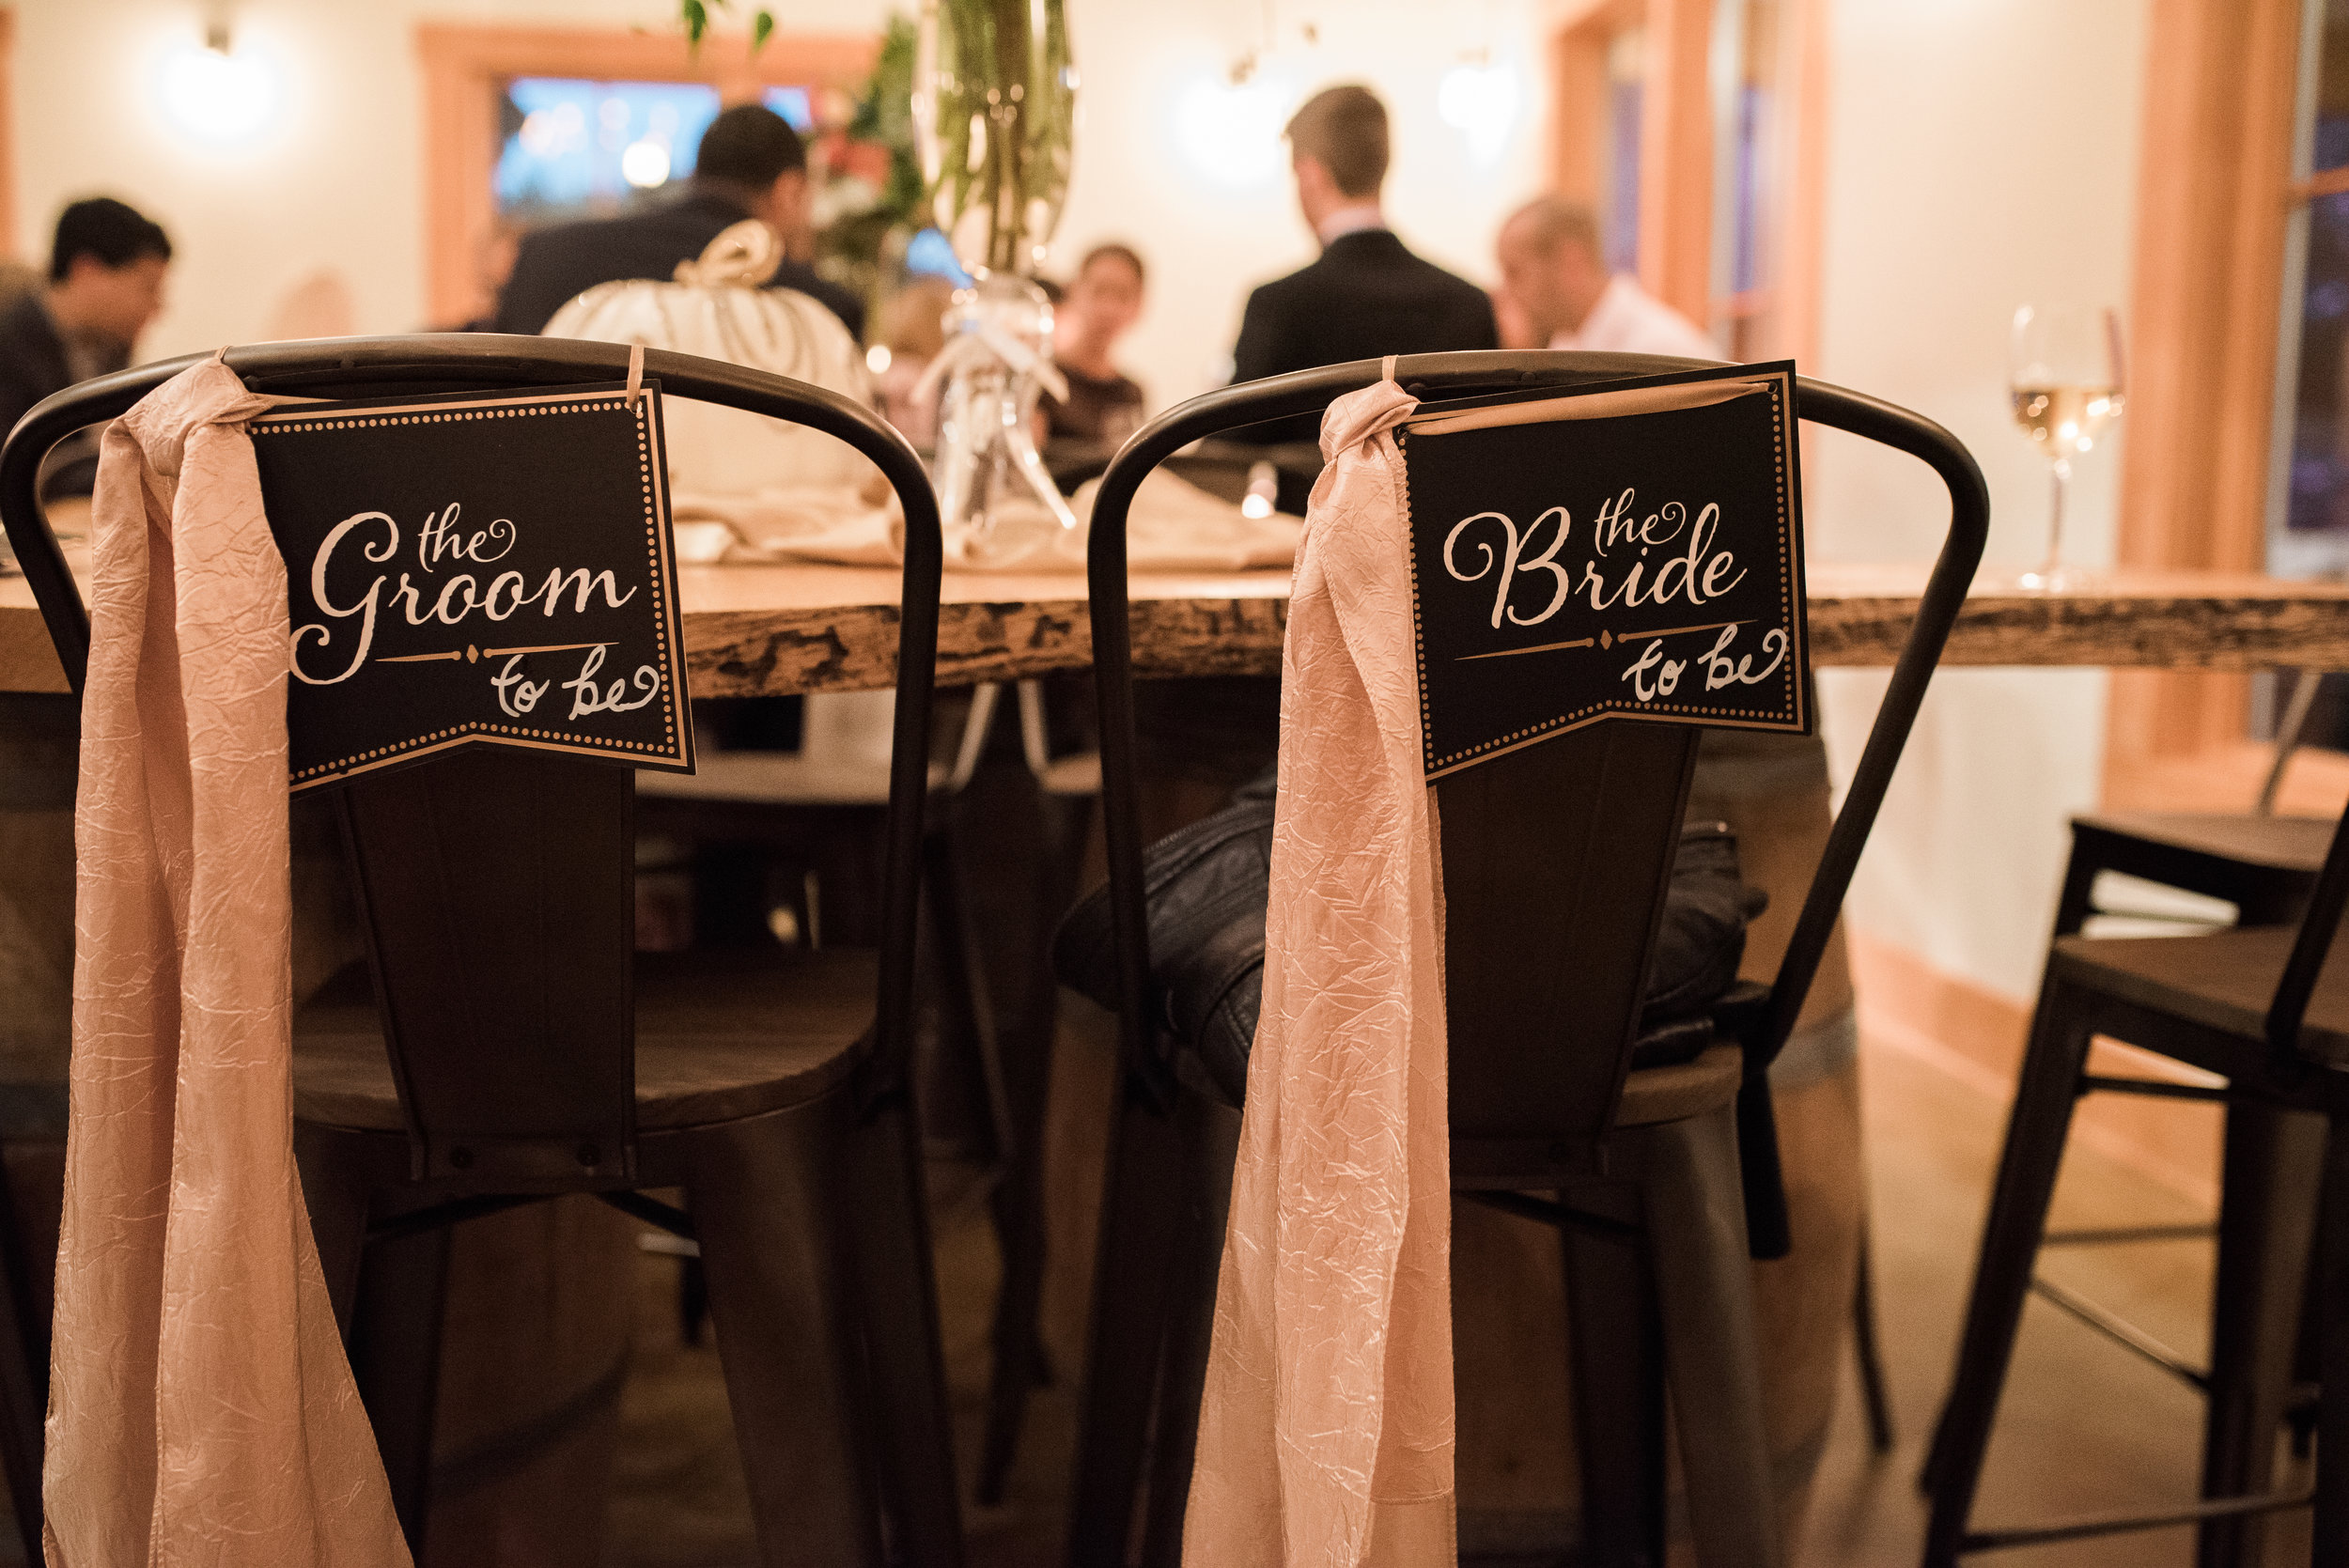 Engagement-Maryland-Winery-photos-by-BKLP-Breanna-Kuhlmann-9.jpg